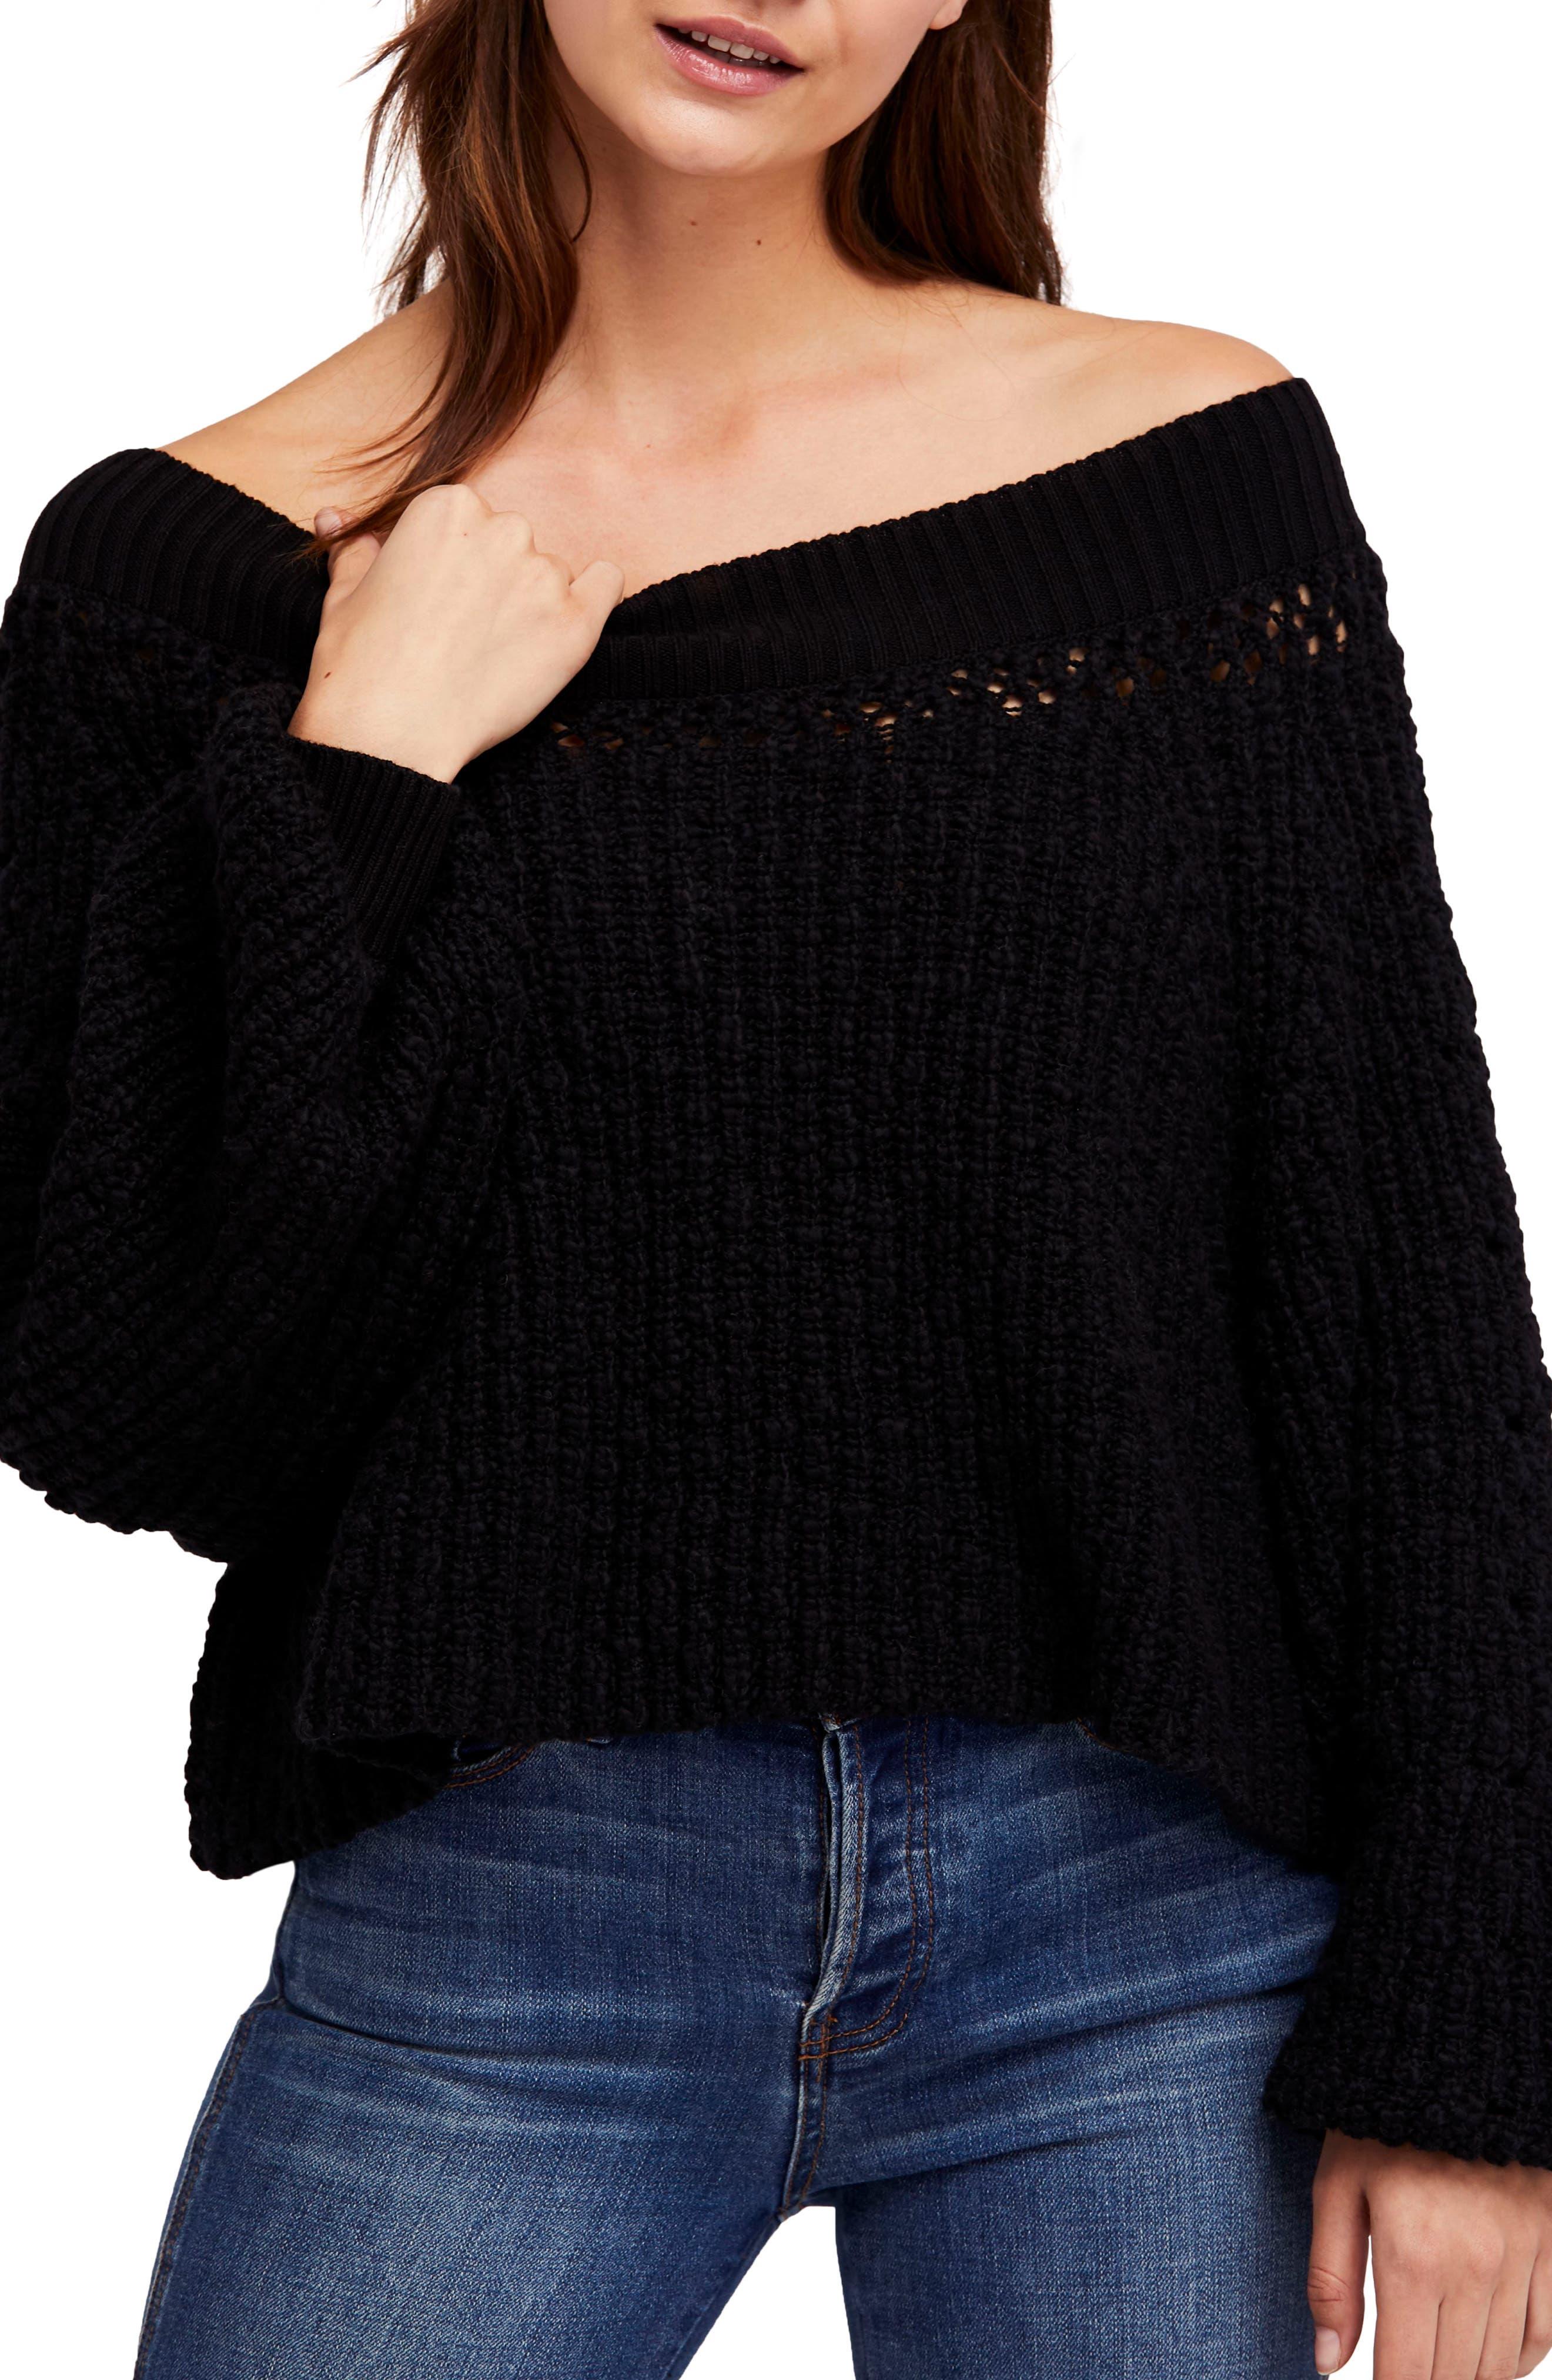 Pandora's Boatneck Sweater,                             Main thumbnail 1, color,                             Black